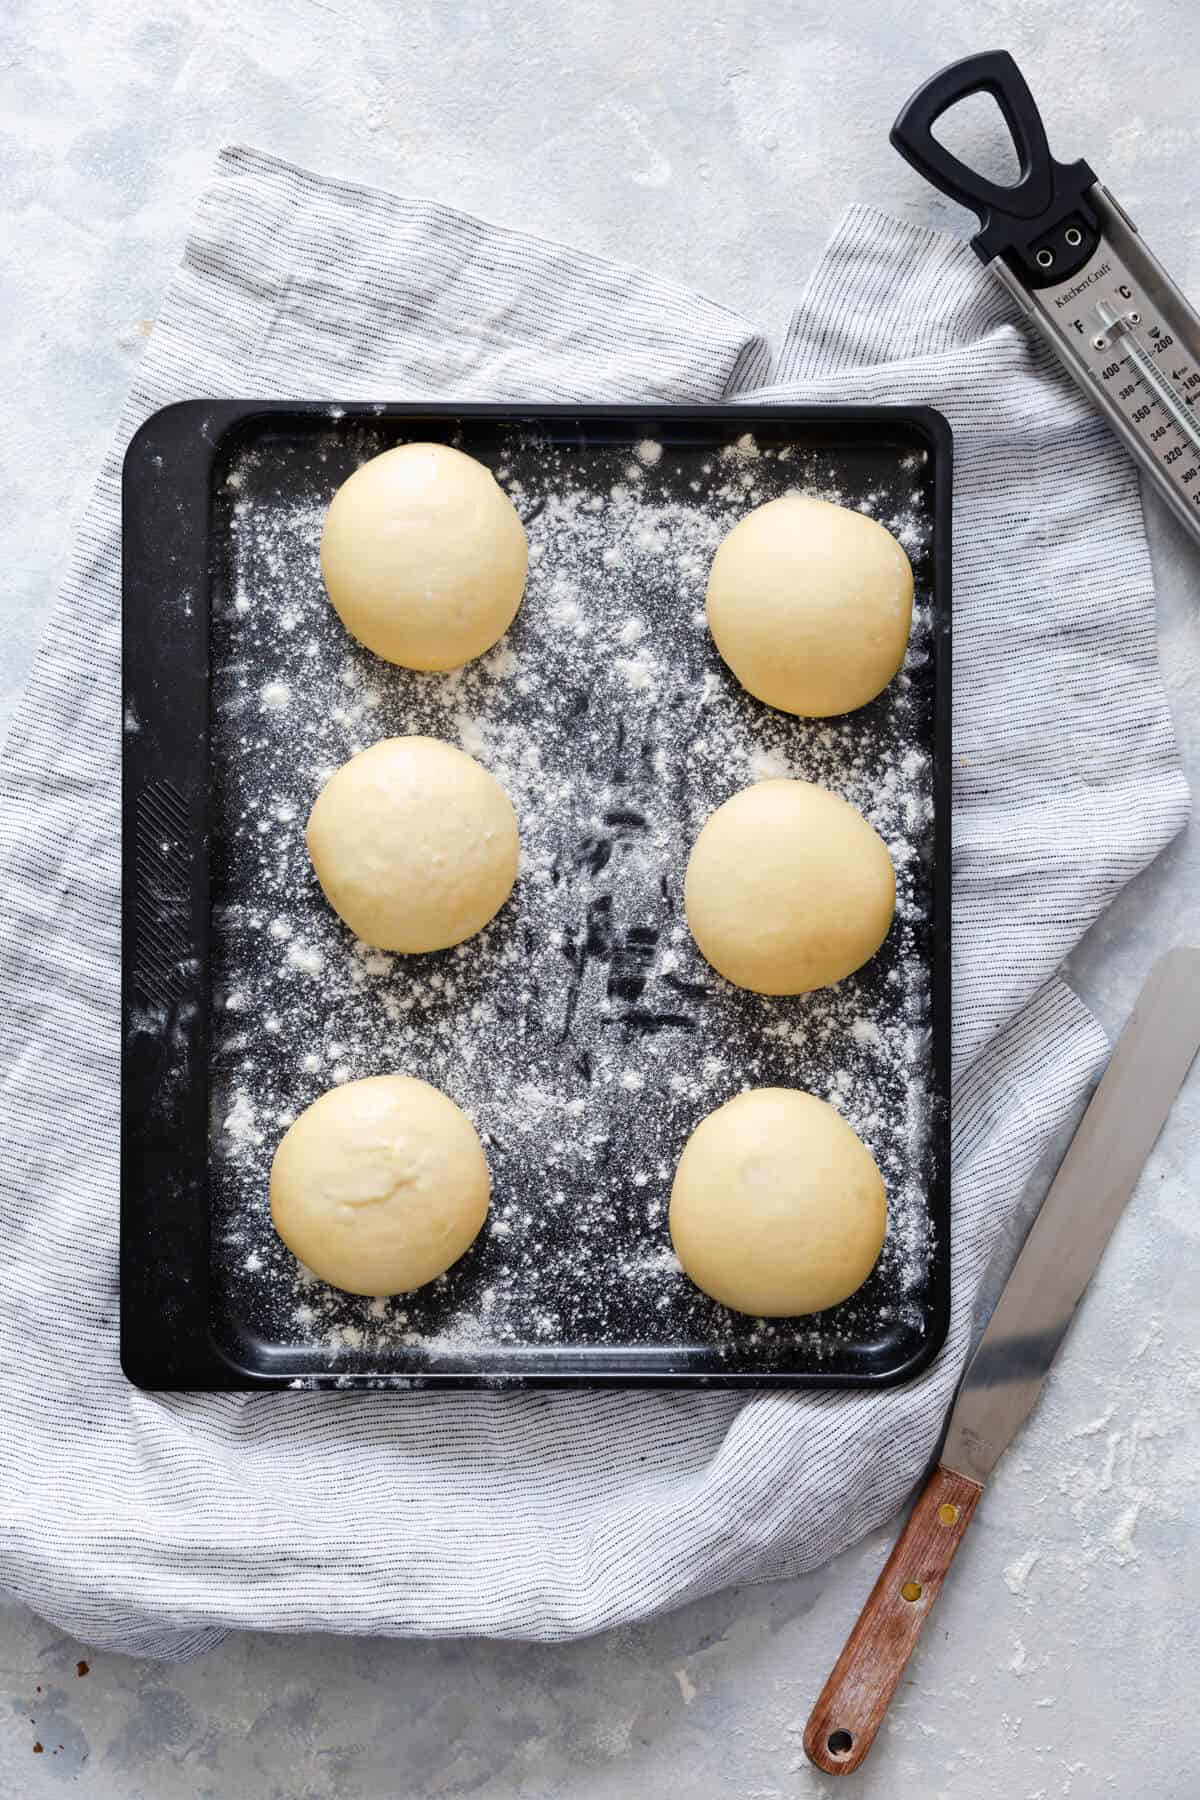 top view of 6 risen dough balls for small batch doughnuts